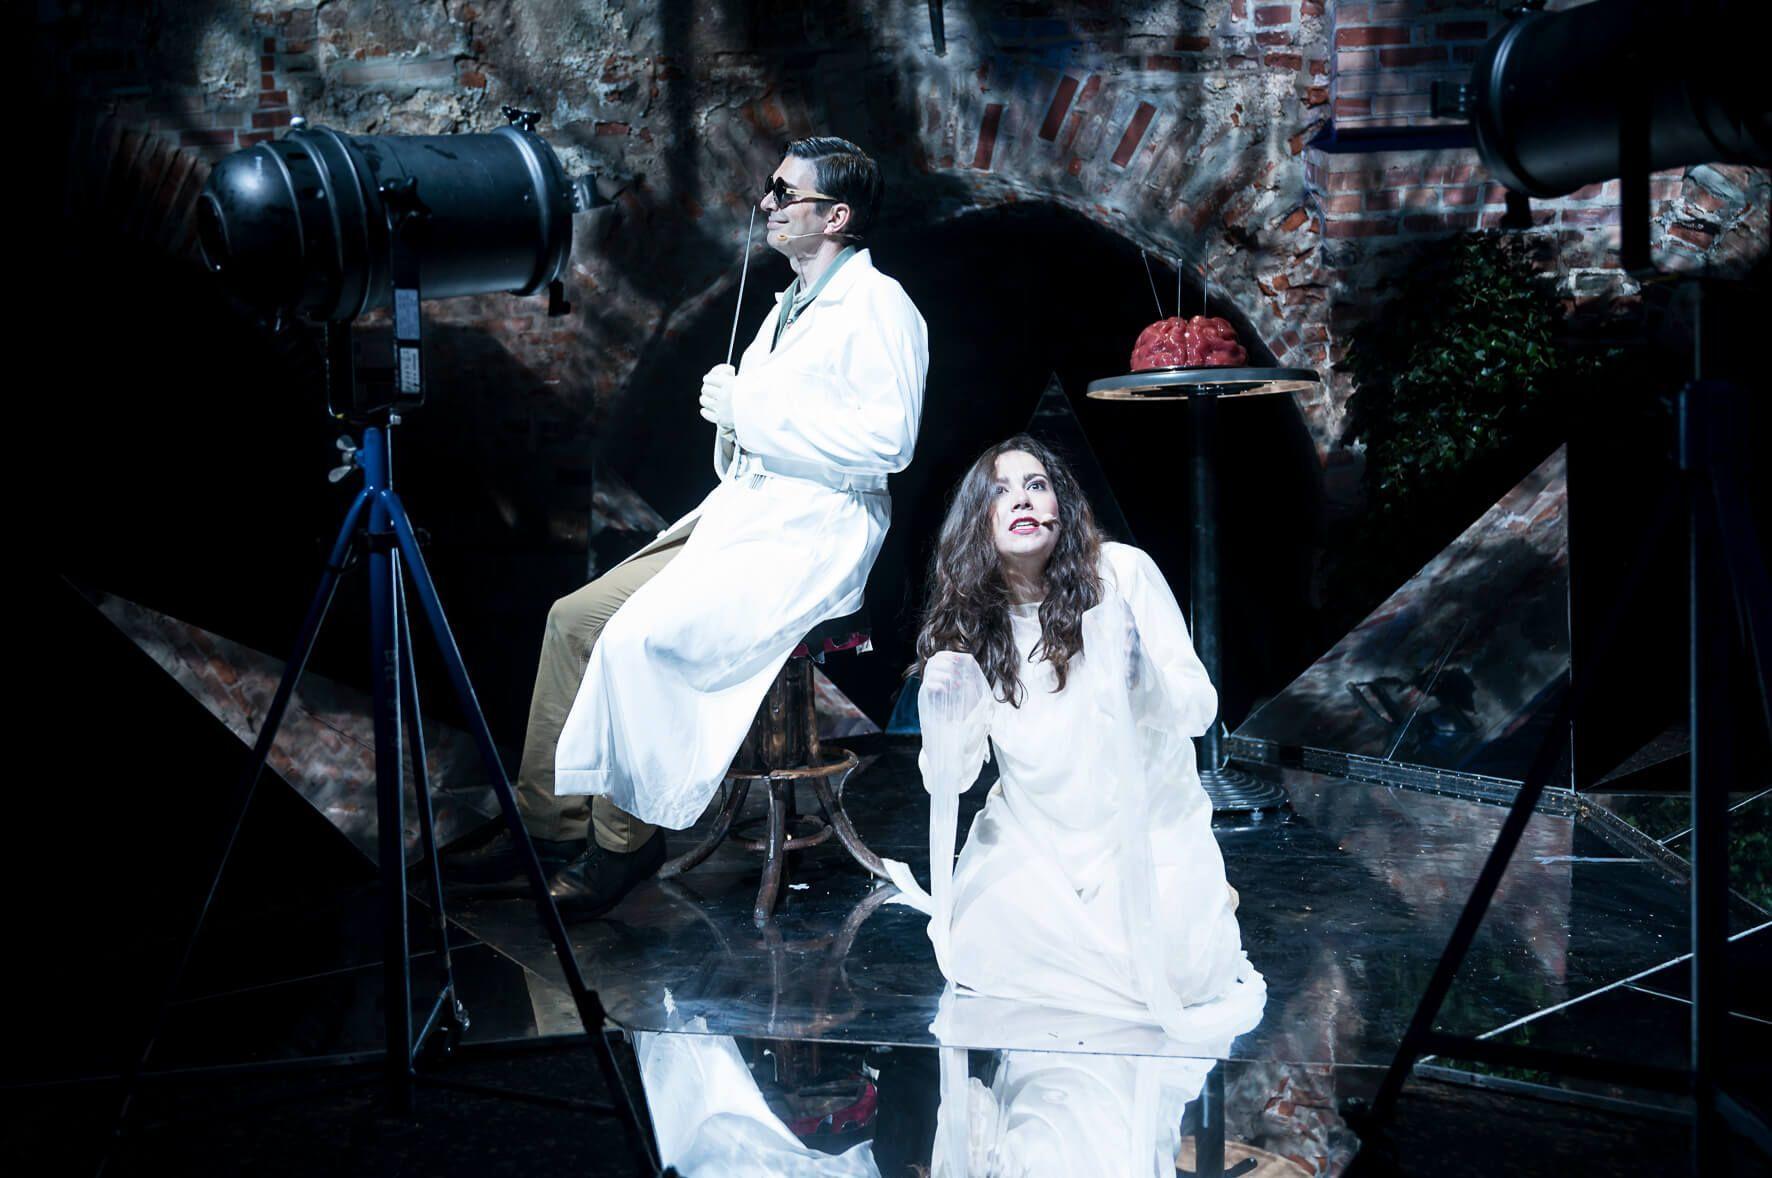 Bariton Ivan Oreščanin and Anna Brull in Piazzola's Tango Operita María de Buenos Aires.